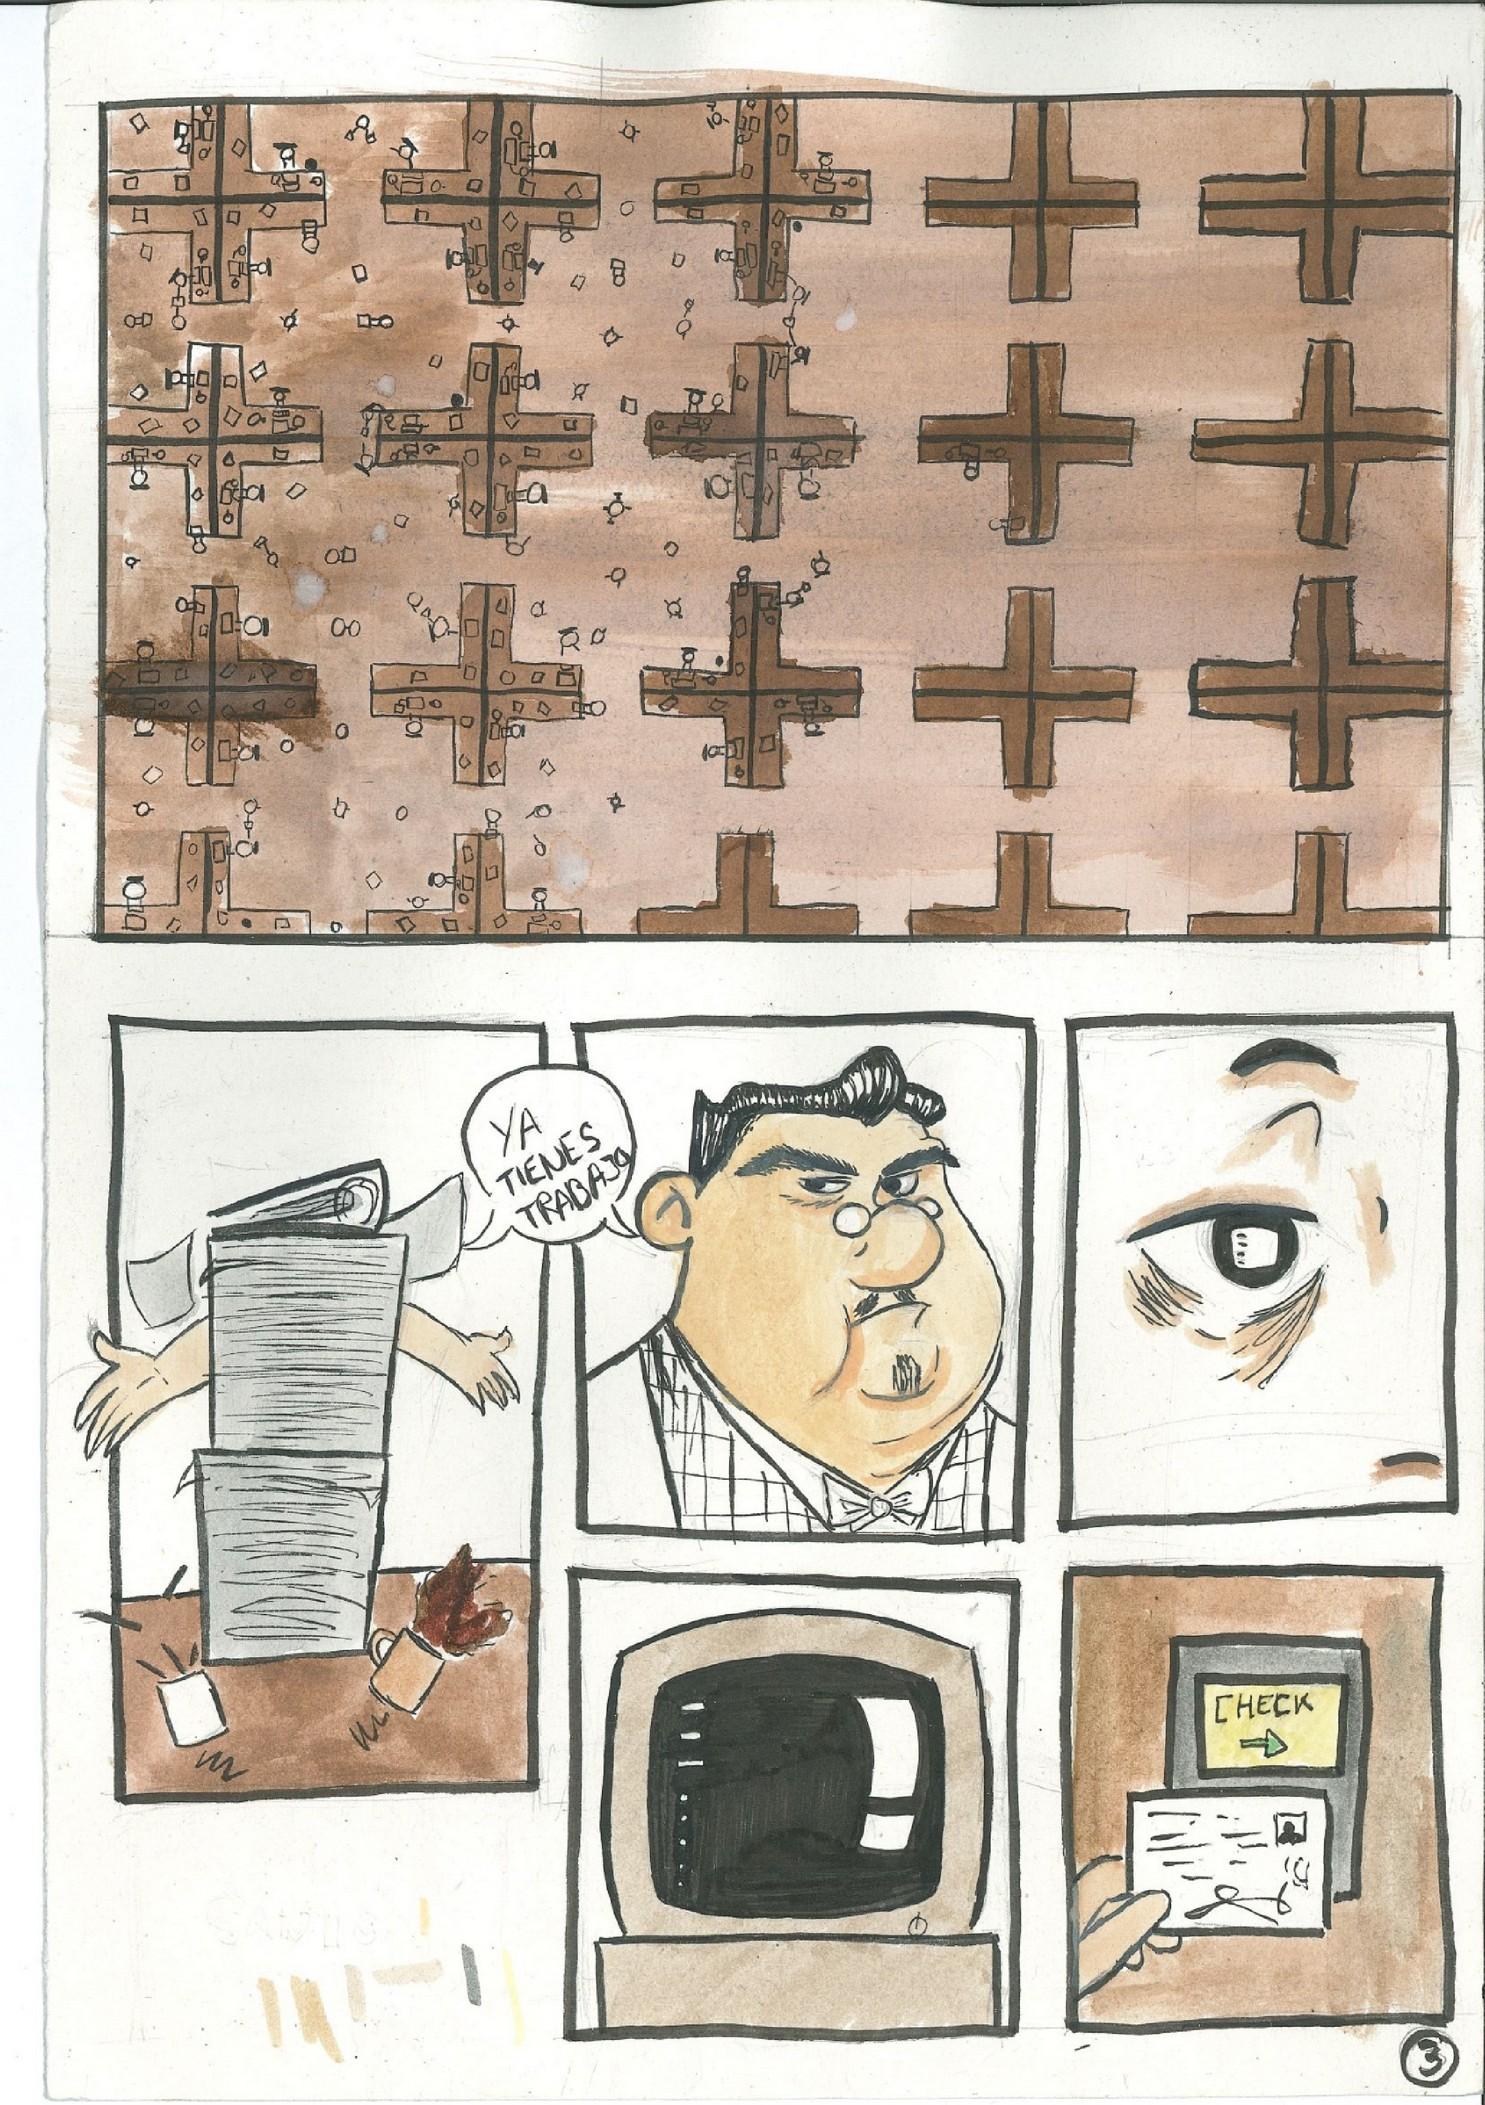 Pills_Maria_Menana_El_Kaoutit_Sabiote_pagina00003